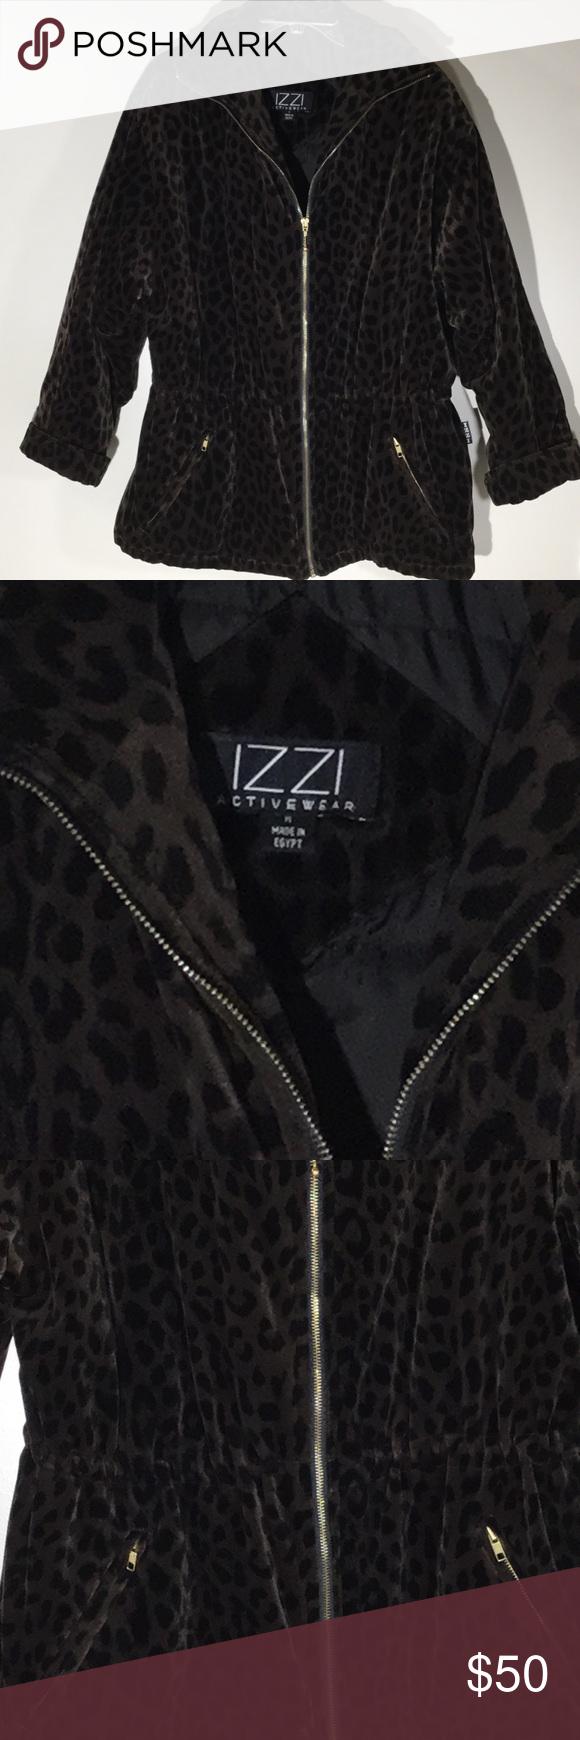 Izzi Activewear Leopard Print Full Zip Coat Izzi Activewear Leopard Print Full Zip Coat Zipper Pockets Cinch Waist Dry Clean O Zip Coat Fashion Clothes Design [ 1740 x 580 Pixel ]